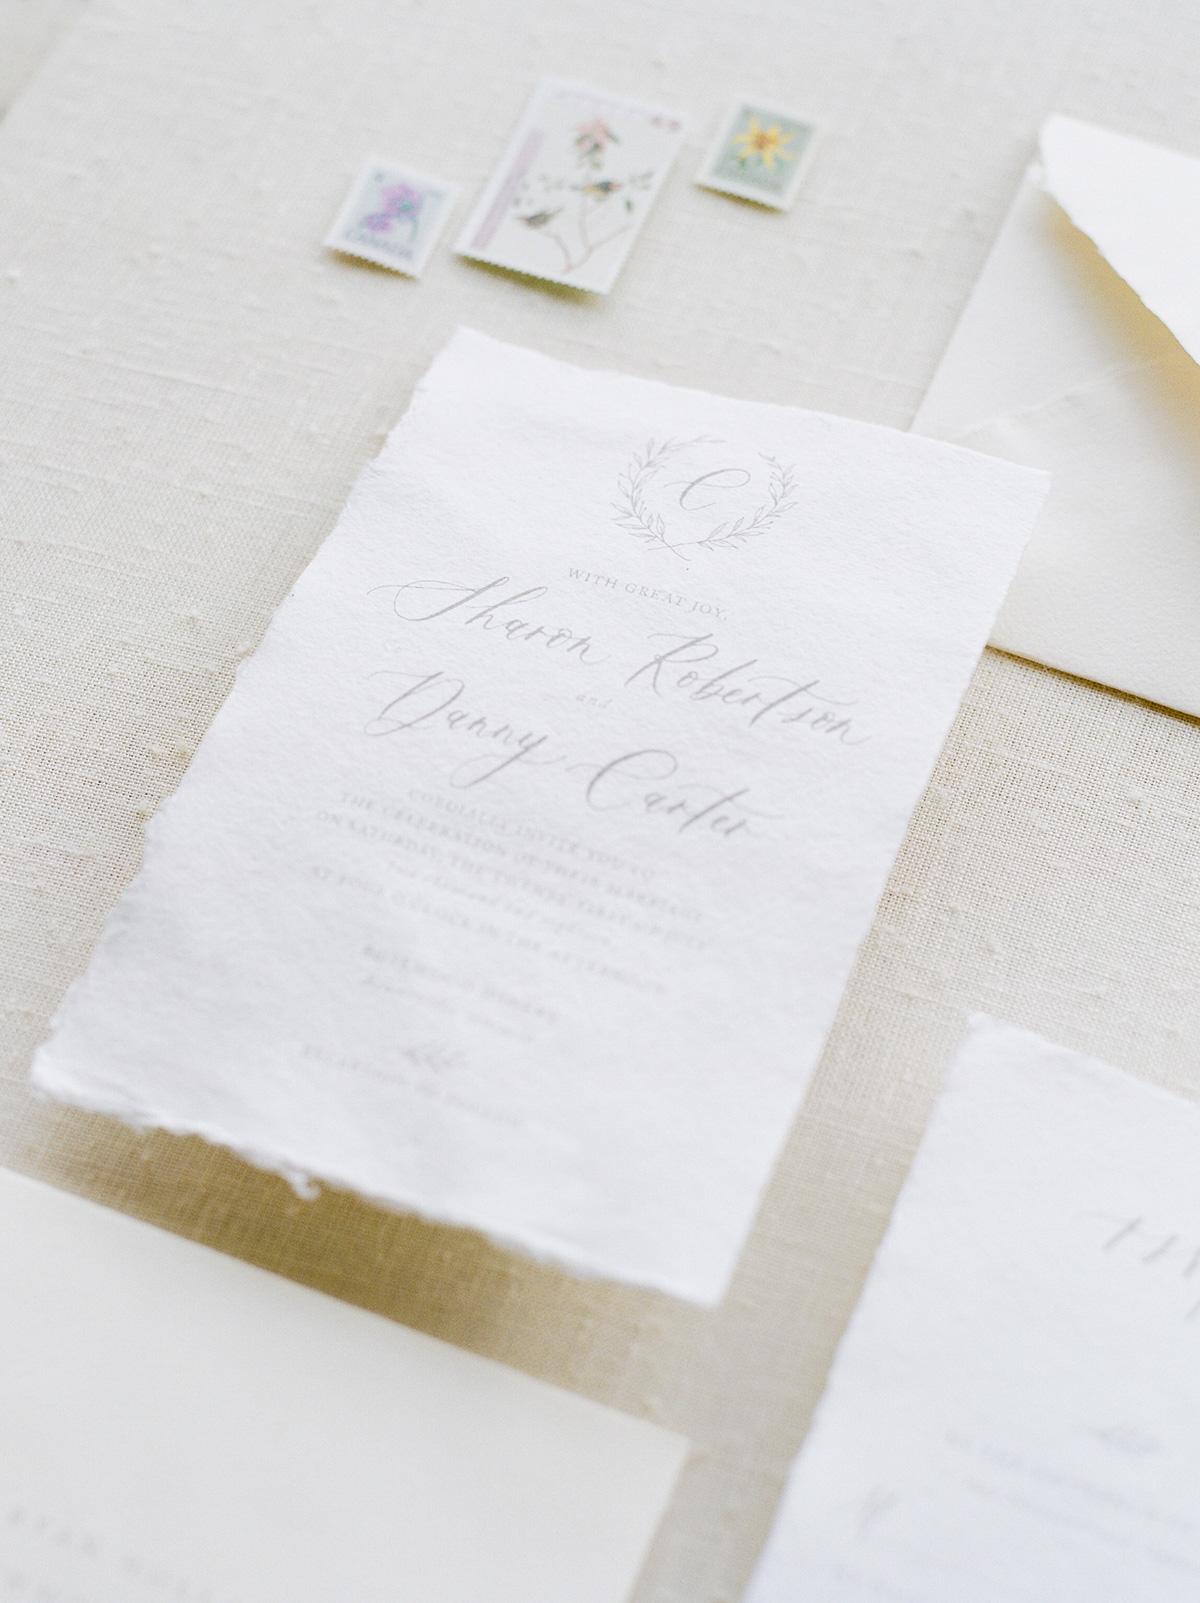 jennifer-xu-photography-vineyard-bride-swish-list-rosewod-eatstes-winery-beamsville-wedding-editorial-29.jpg